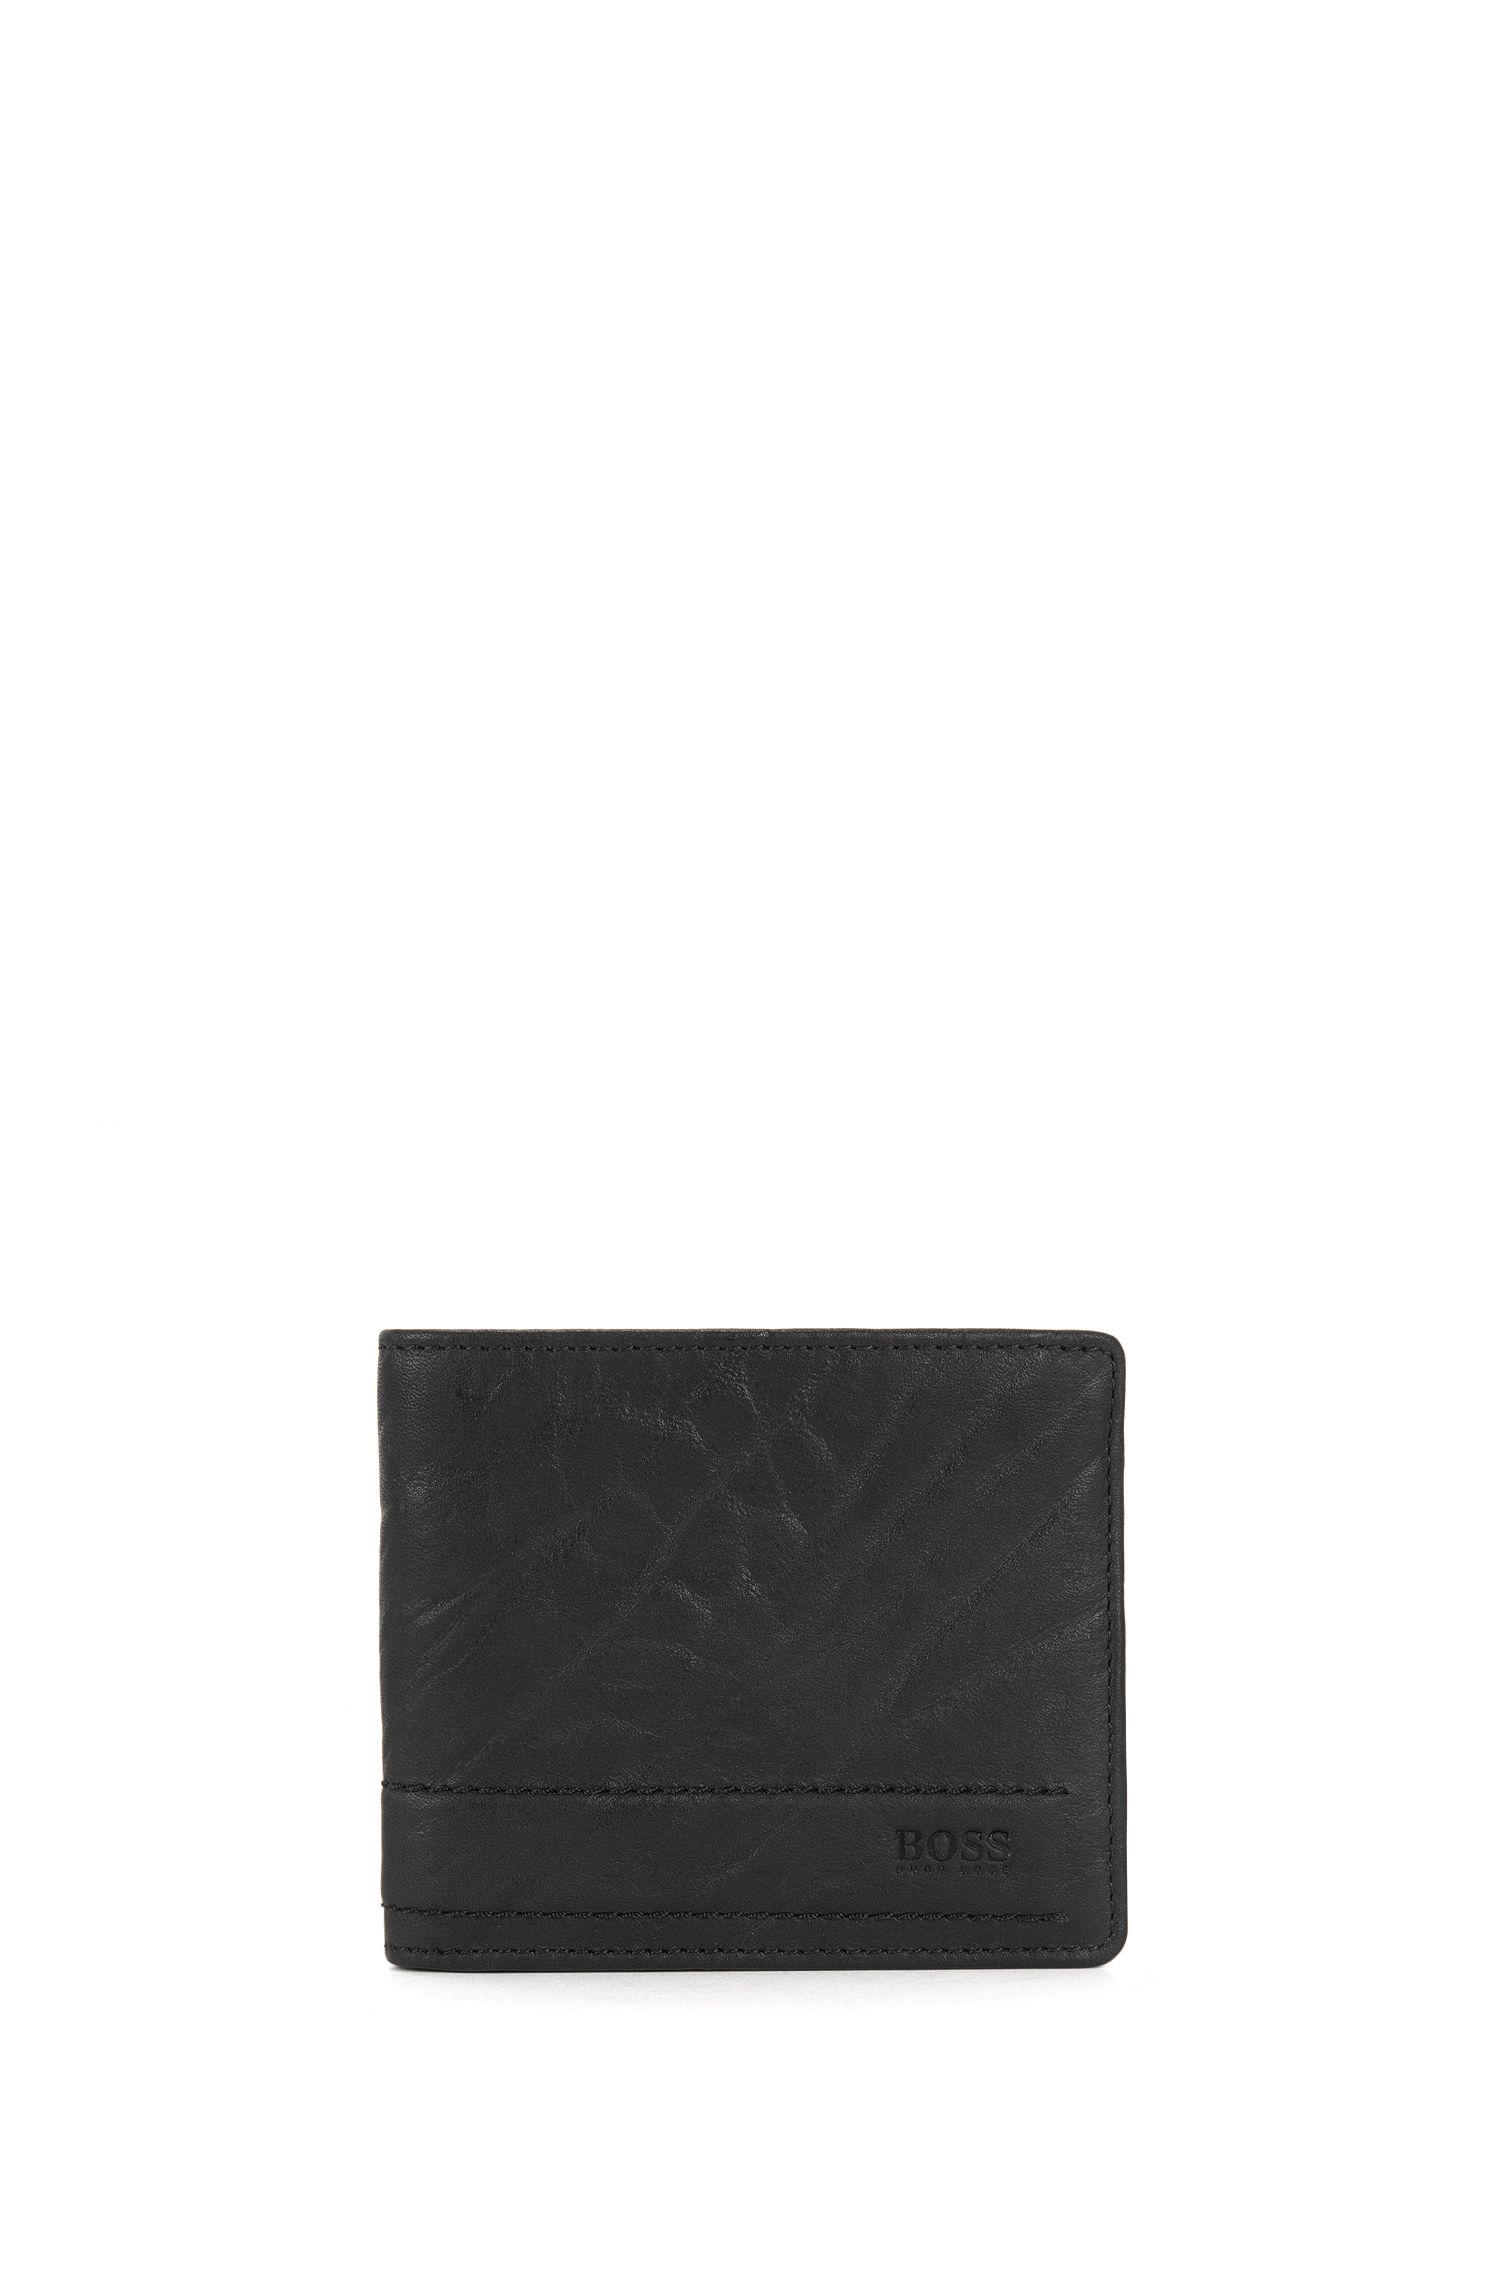 Openklapbare portemonnee van generfd rundleer